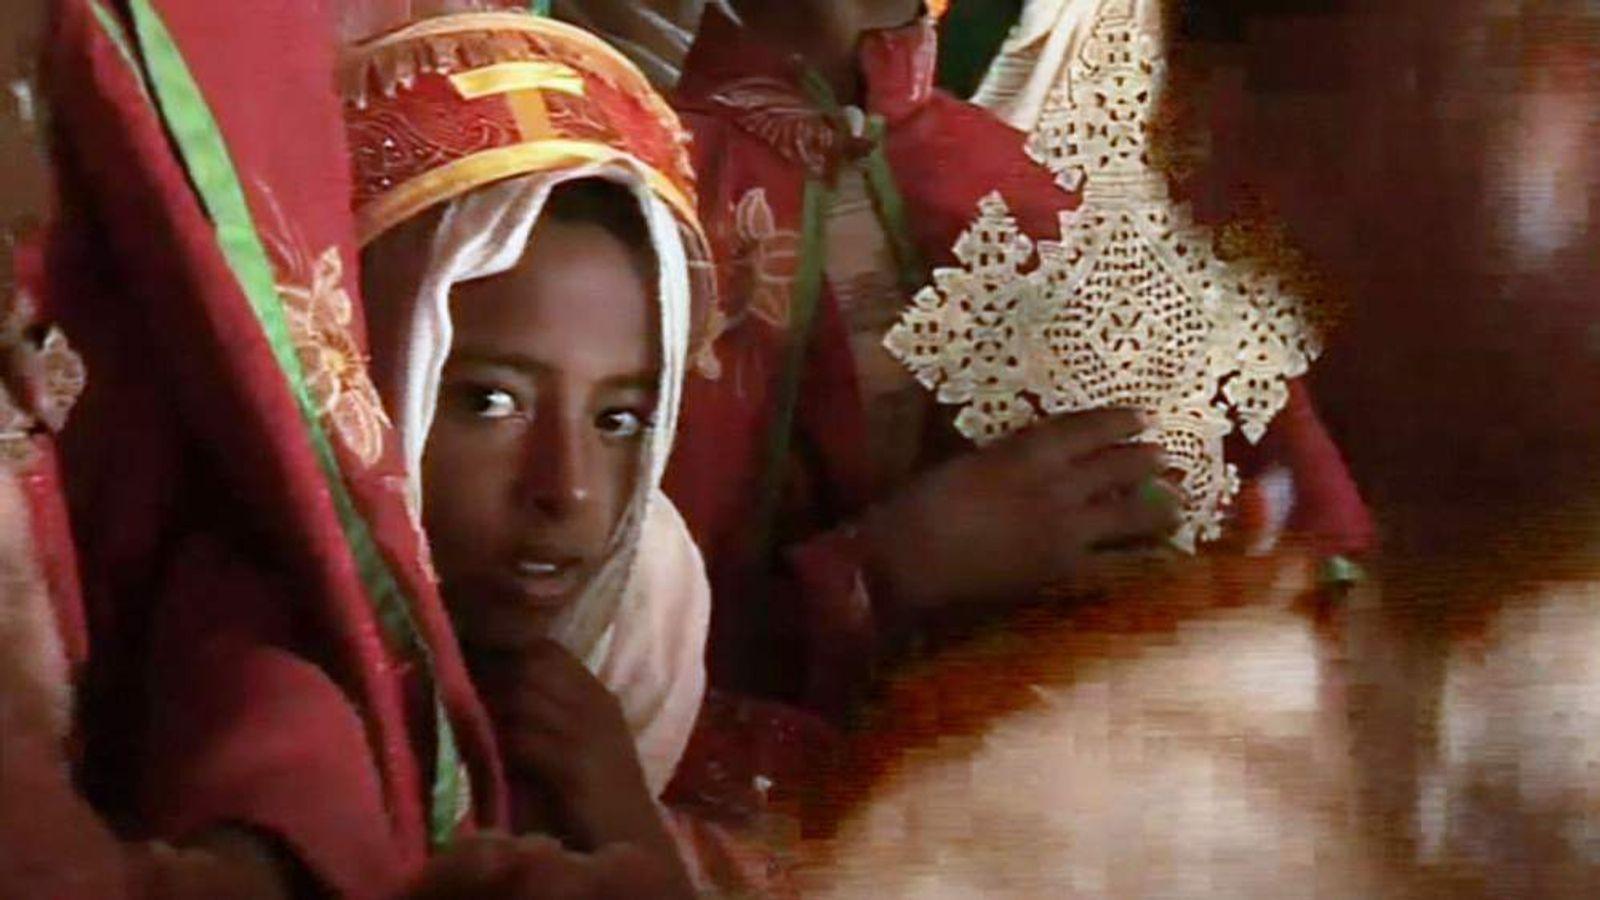 Girl in Ethiopia